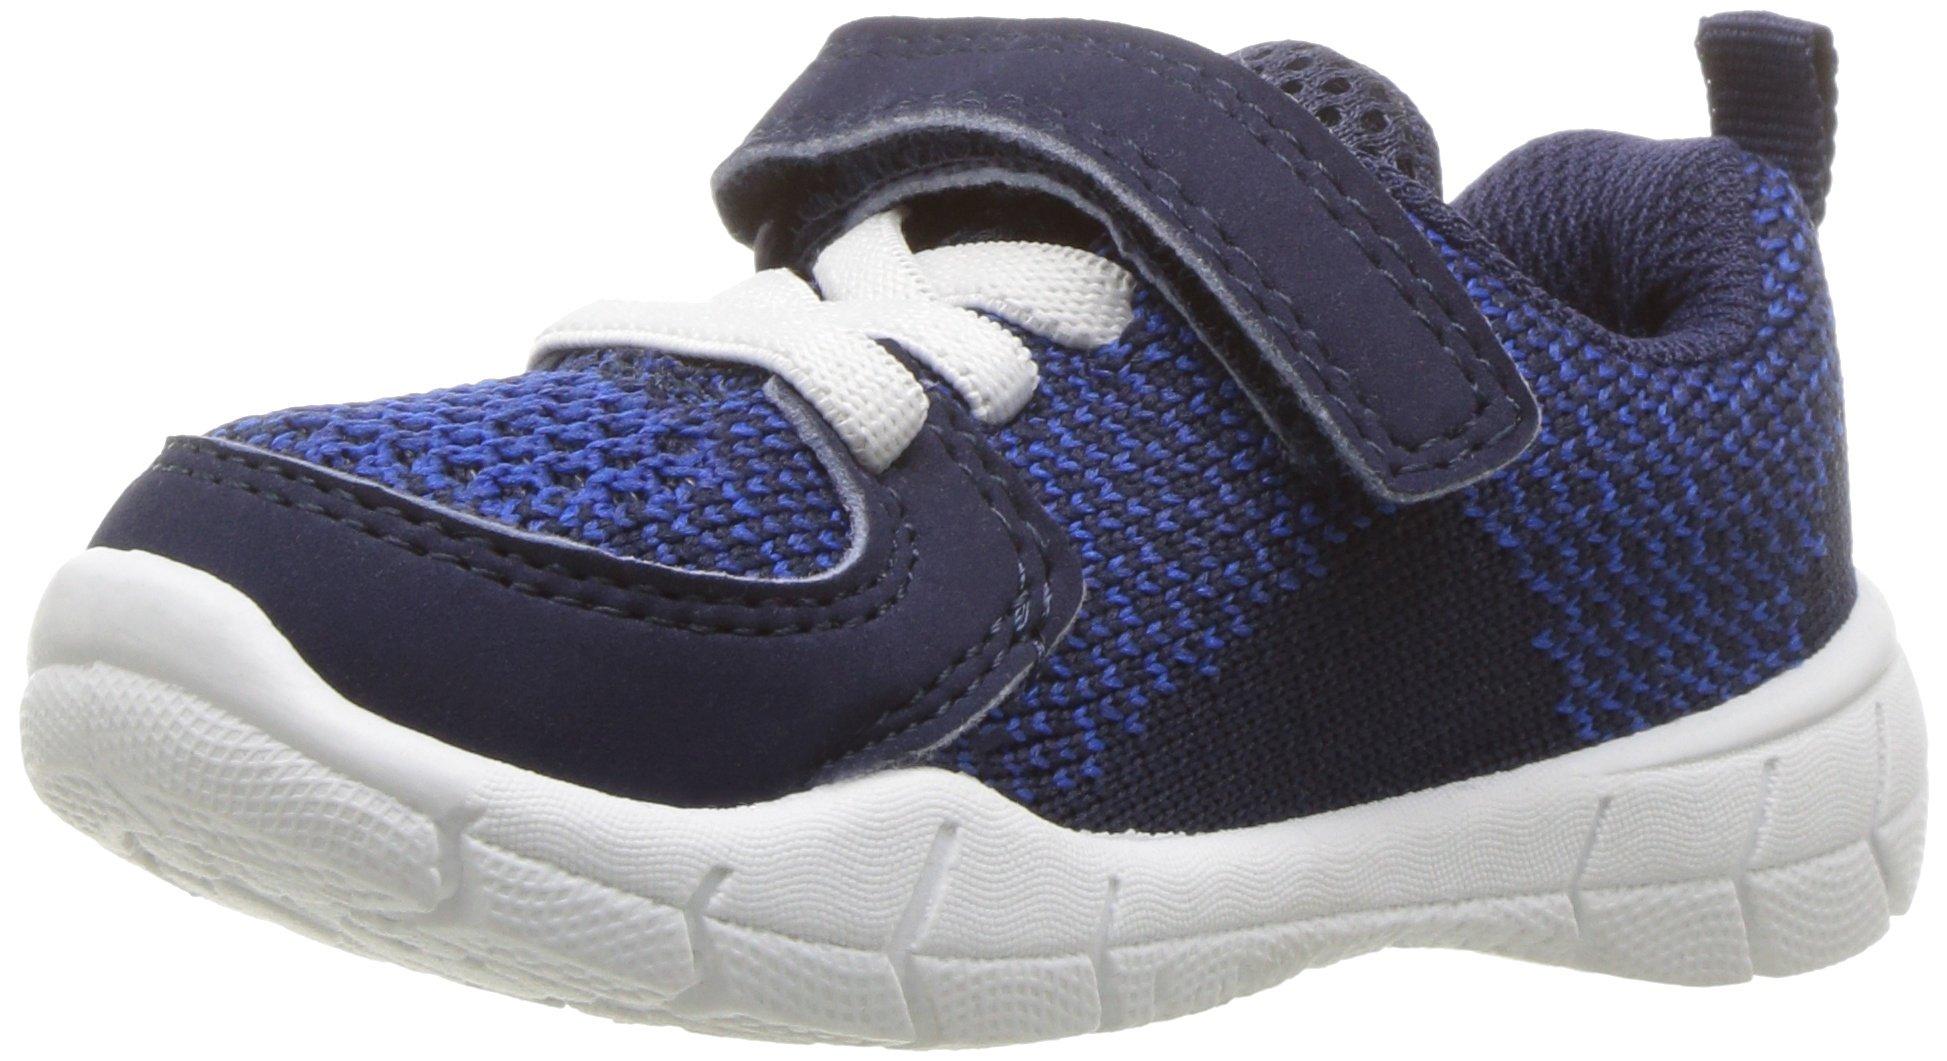 Carter's Boys' Avion-B Blue Athletic Sneaker, Navy, 8 M US Toddler